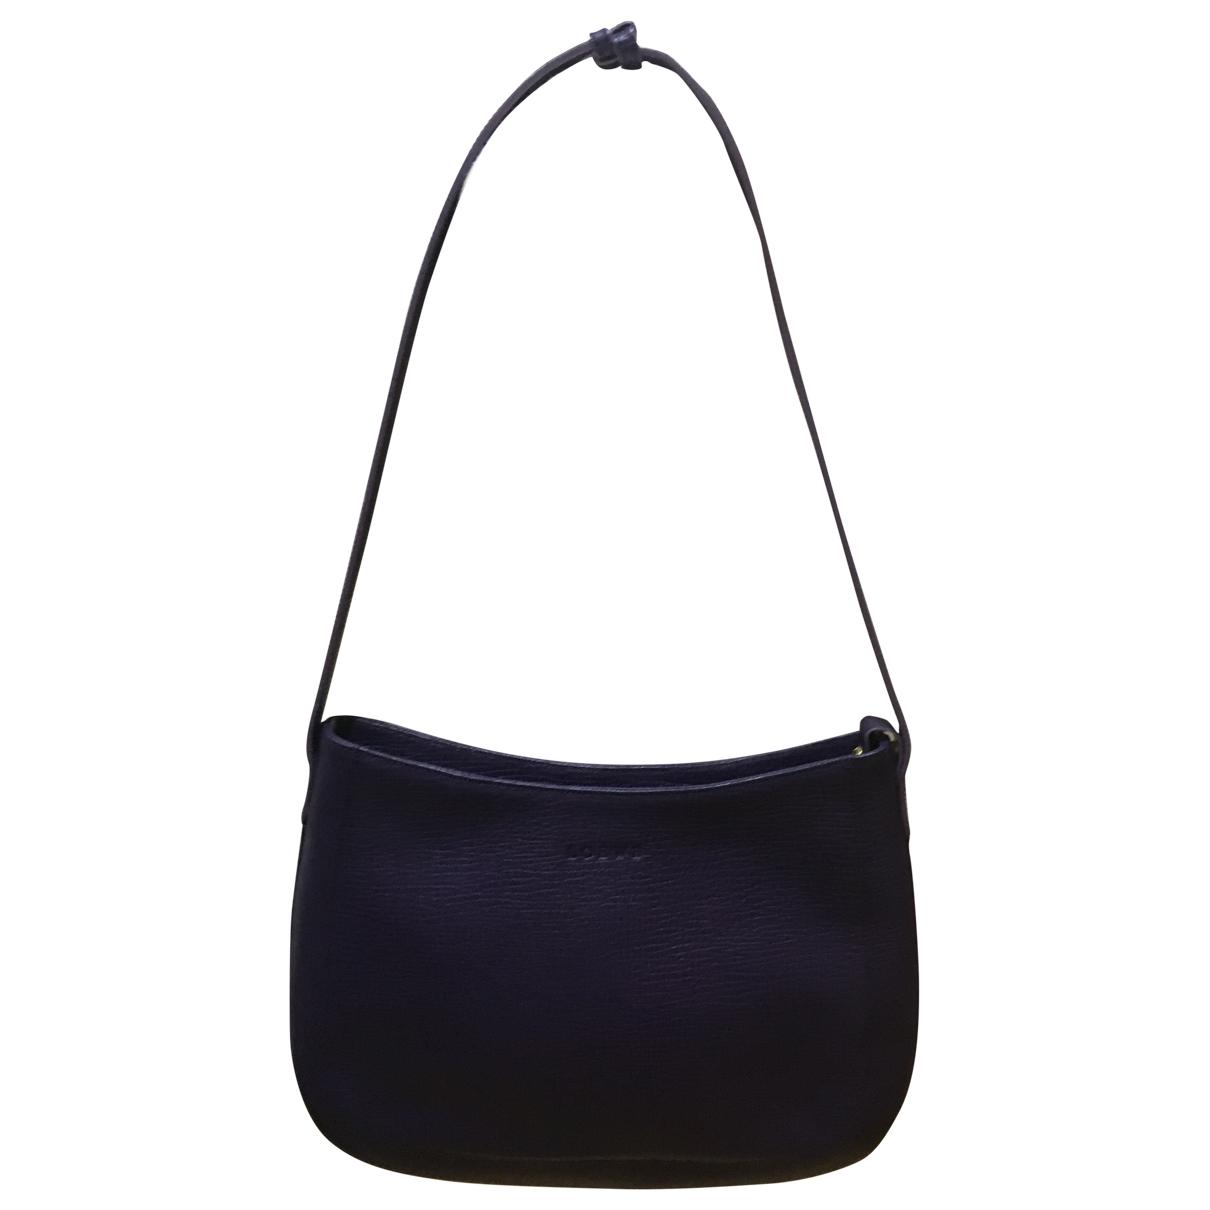 Loewe - Sac a main   pour femme en cuir - violet